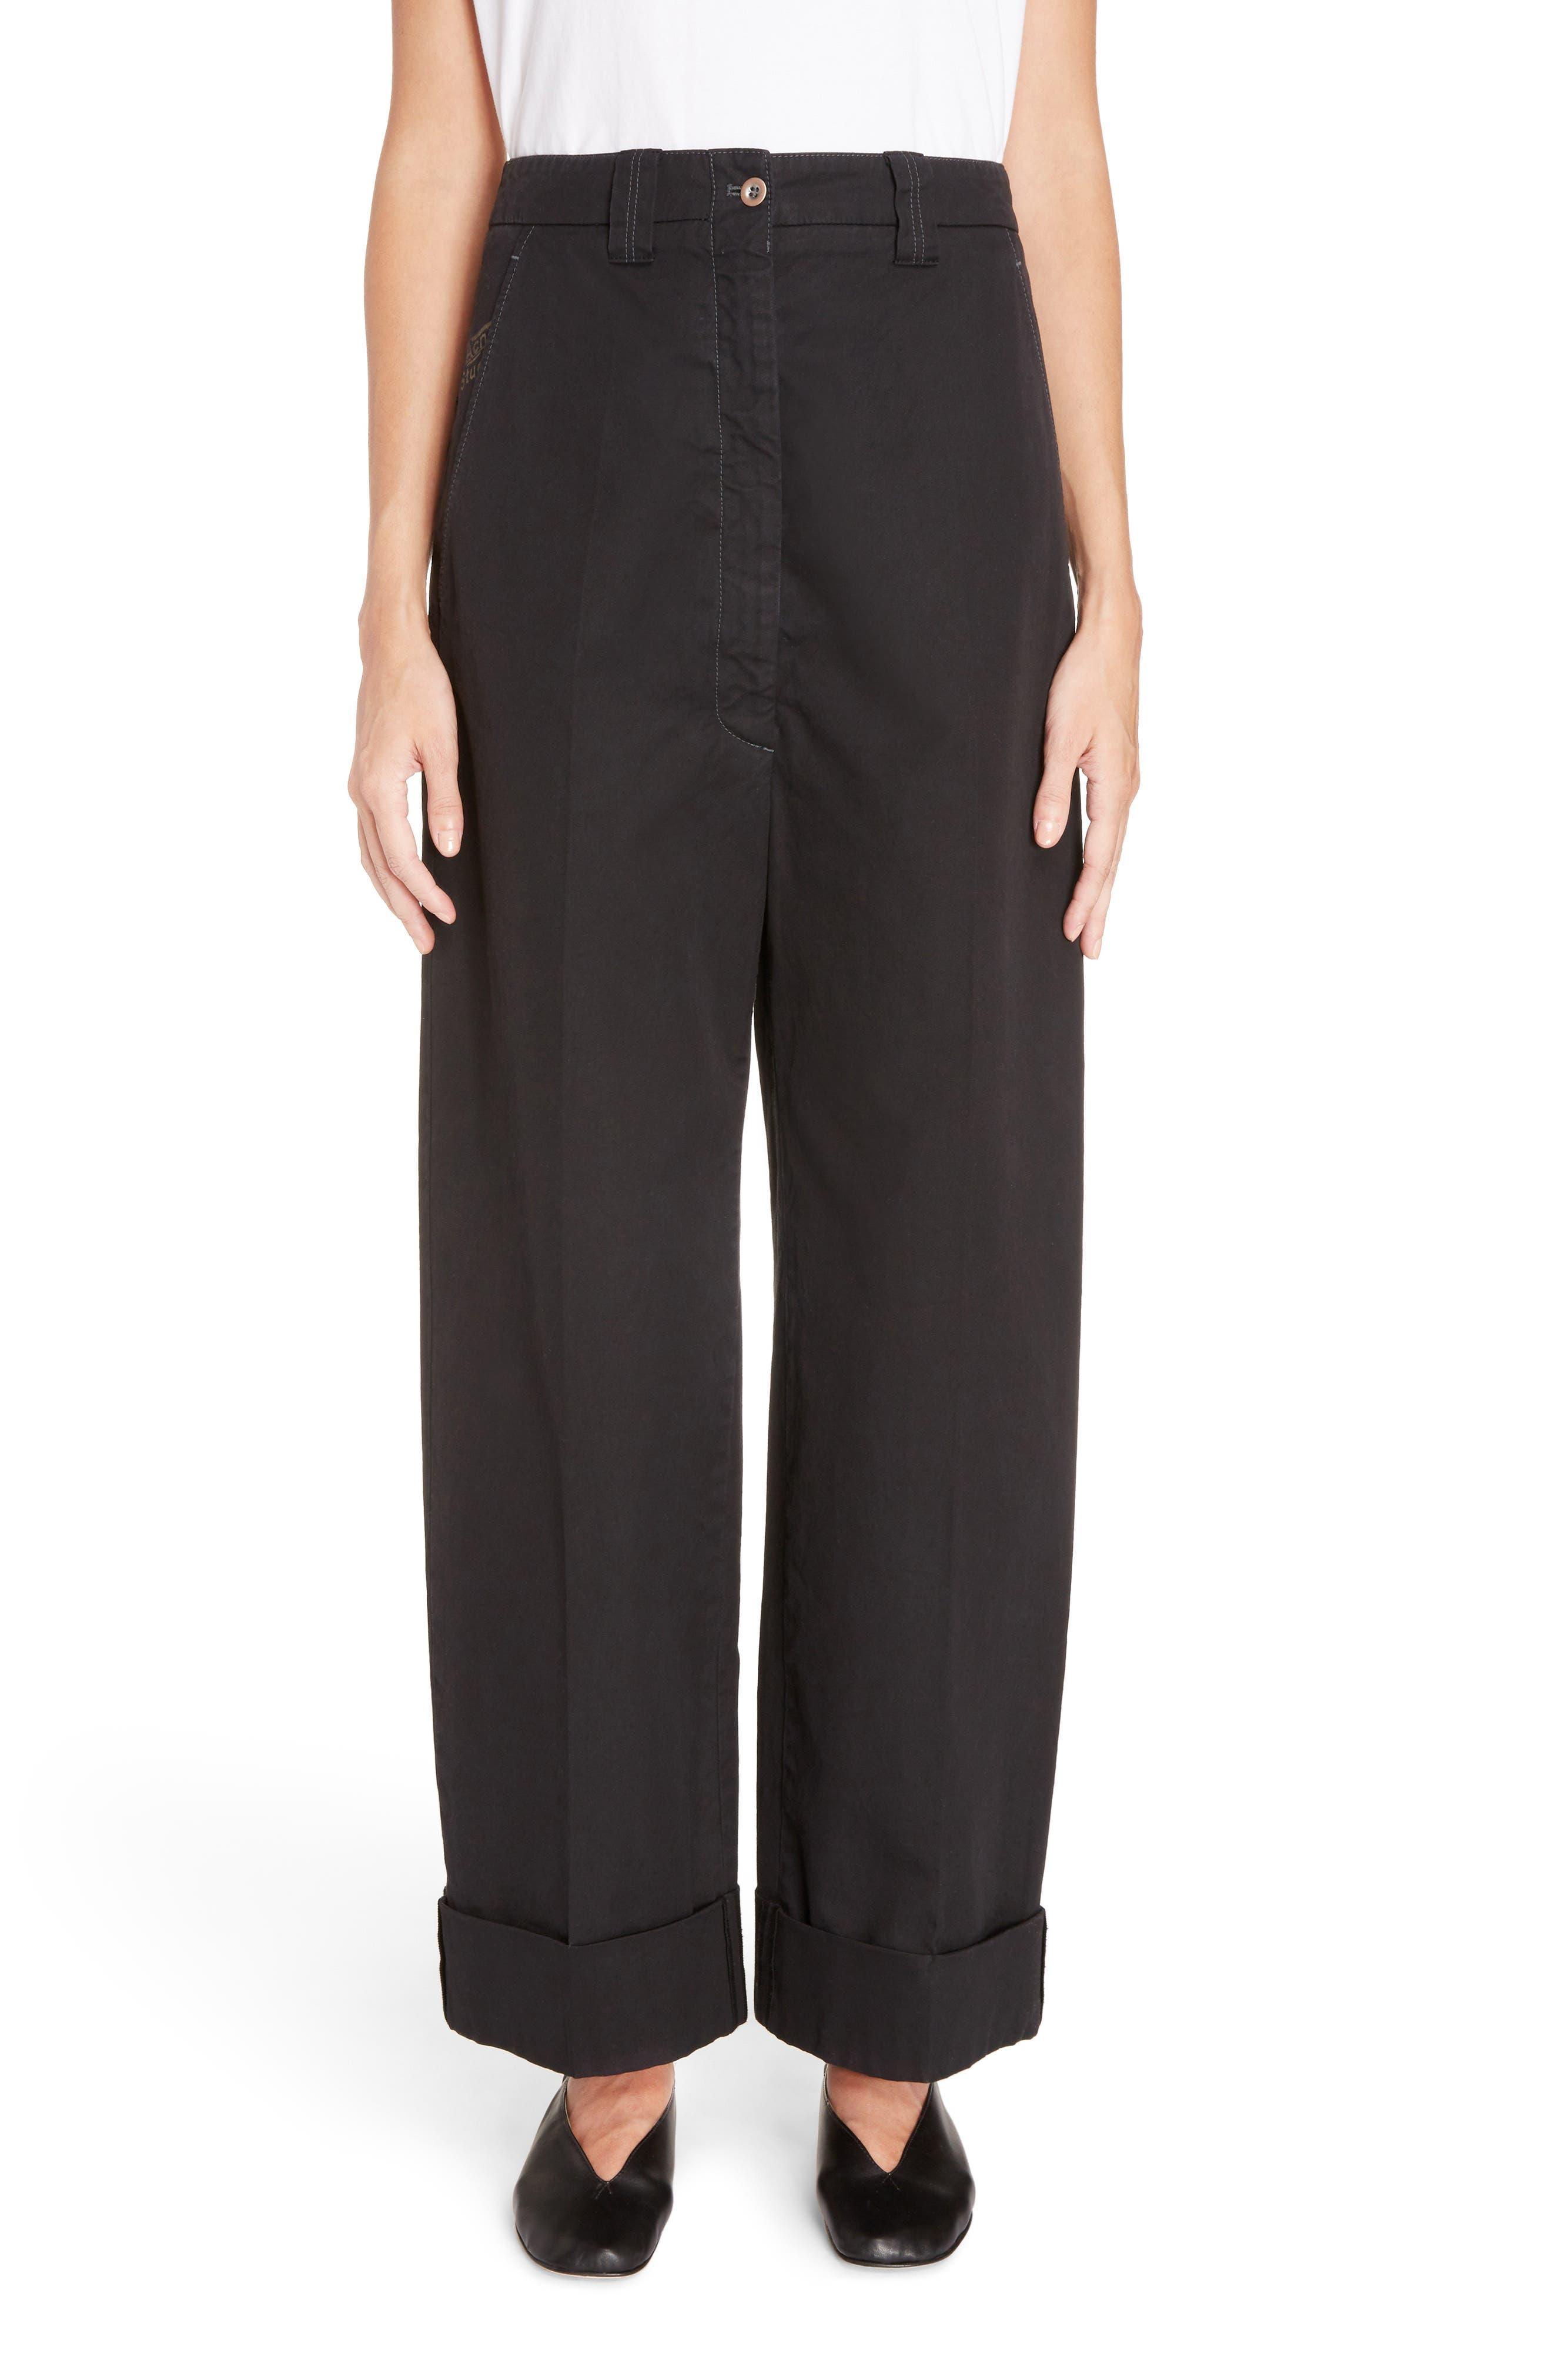 Madya Cuffed Cotton Pants,                             Main thumbnail 1, color,                             001